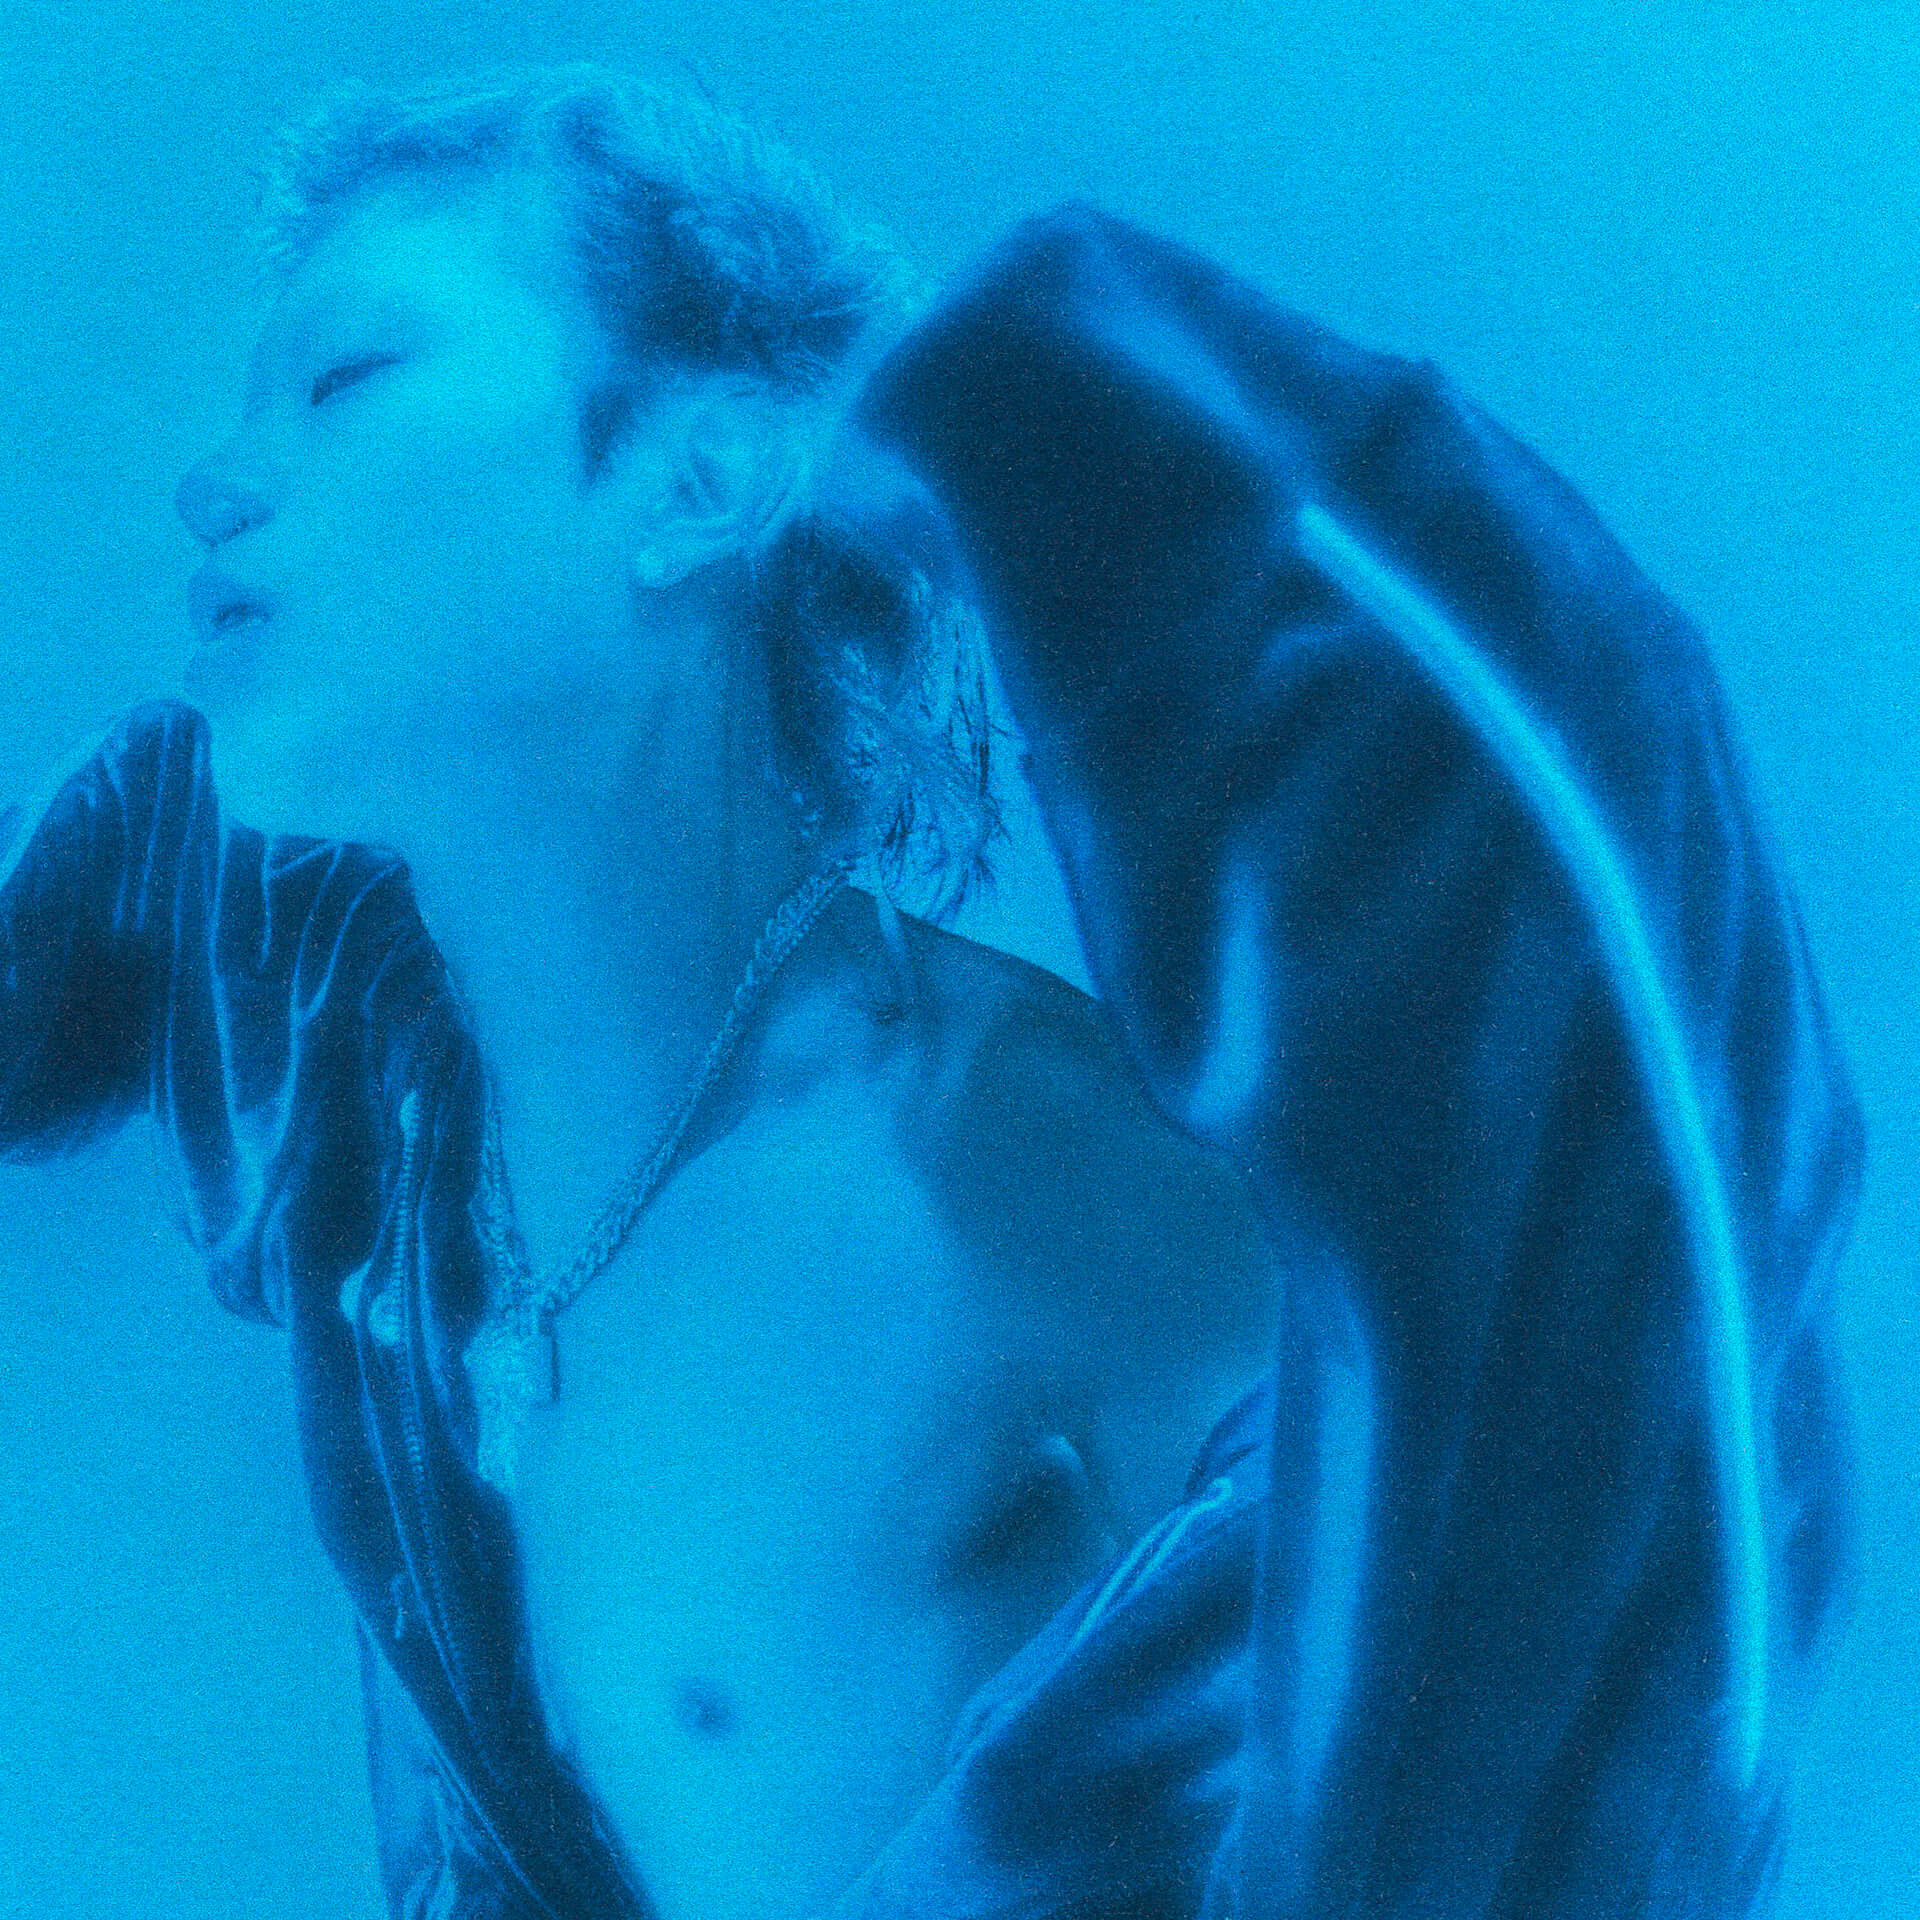 "Tohjiが1年振りの新作""プロペラ *i feel ima propella ""she"" she wanna hit""をリリース!MVも公開 music200819_tohji_1-1920x1920"